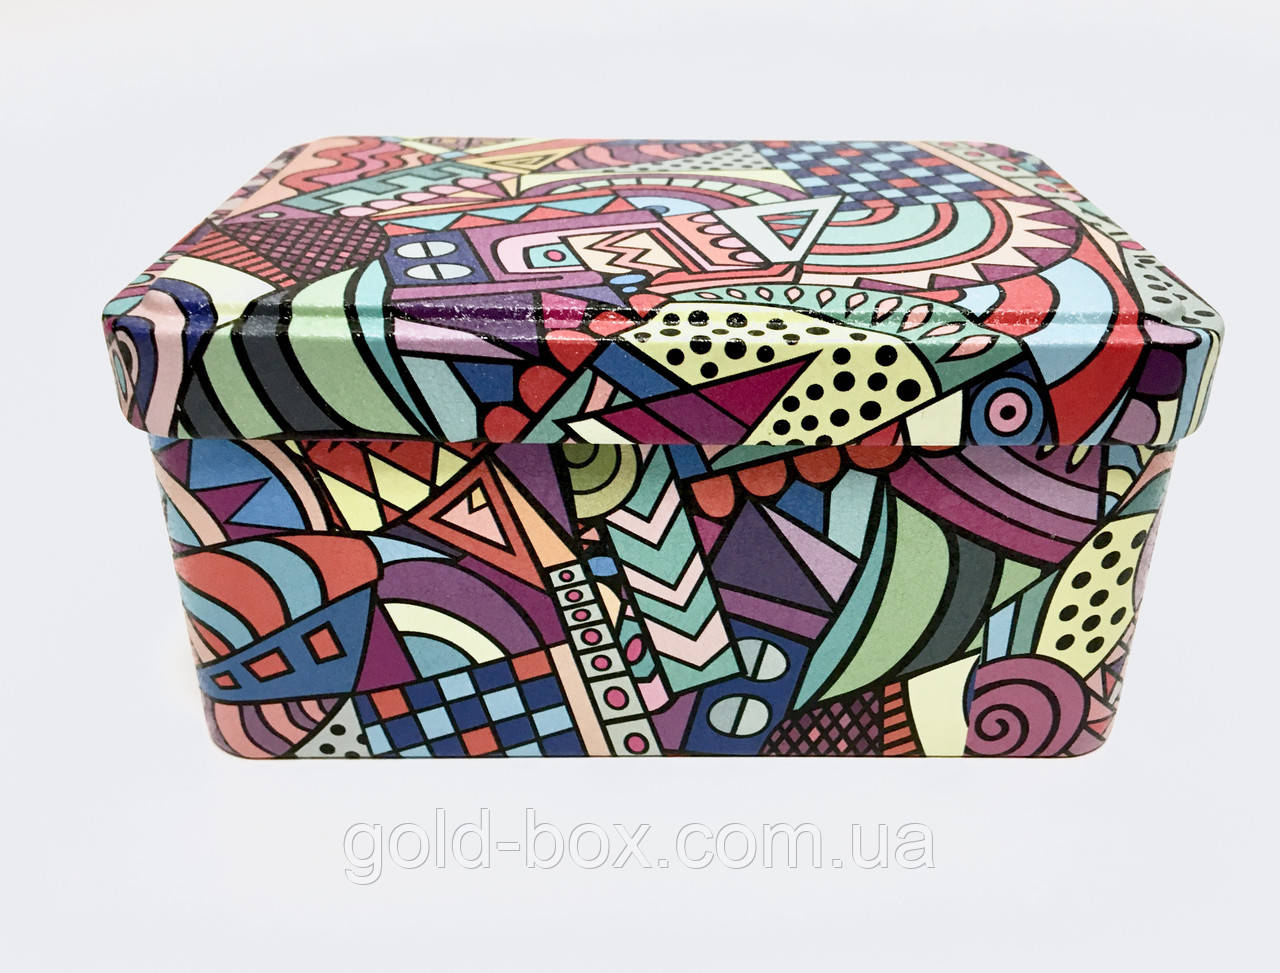 Жерстяна подарункова коробка